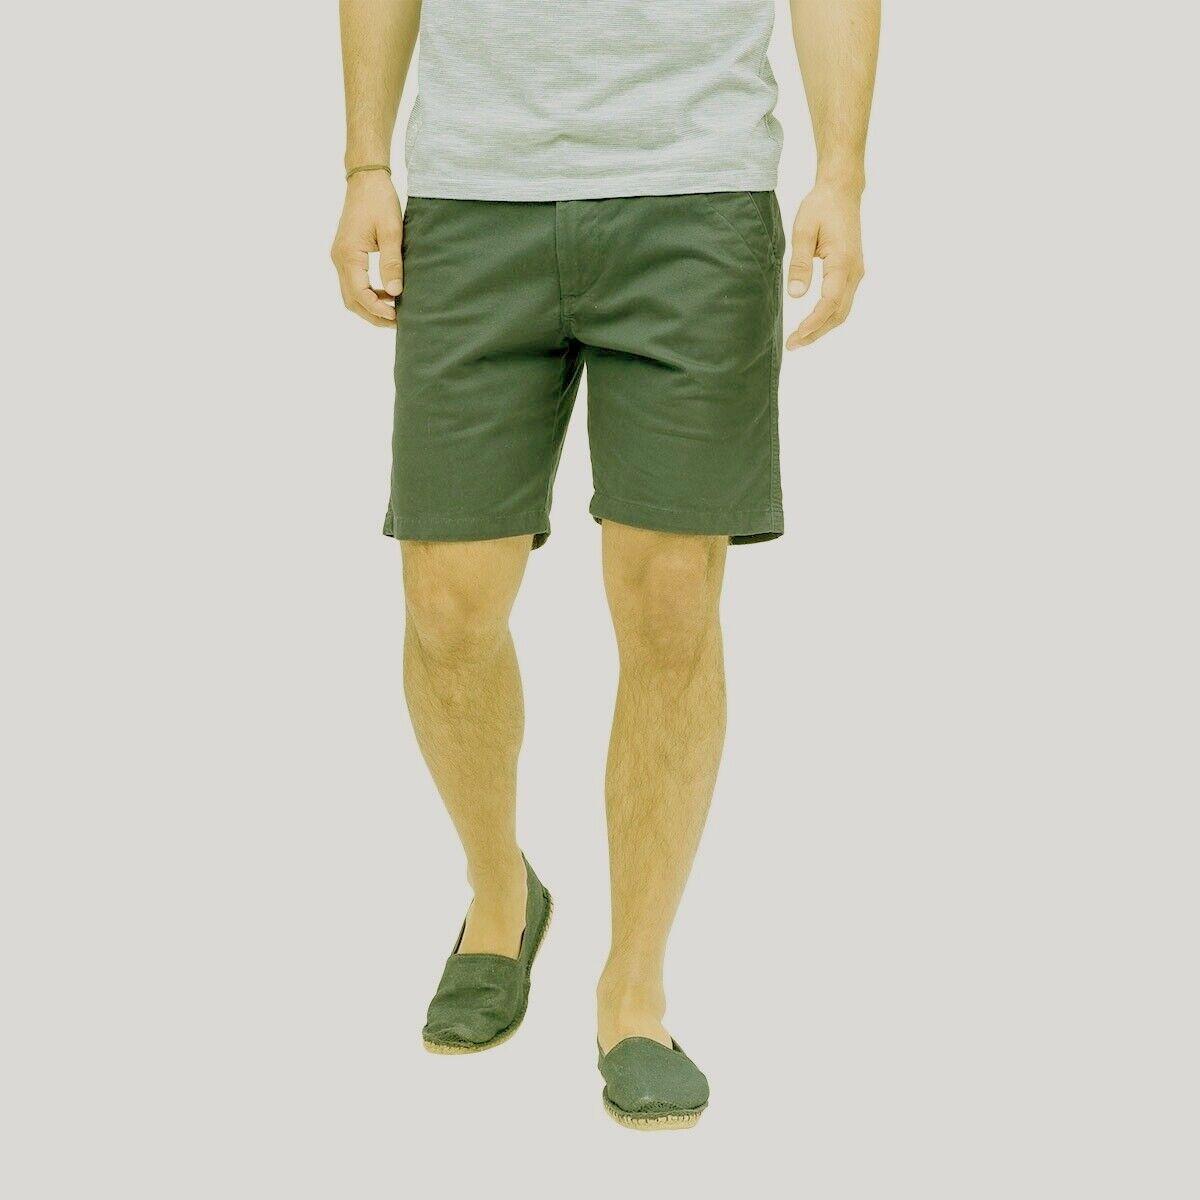 Pantalon short oxbow vert kaki l 42